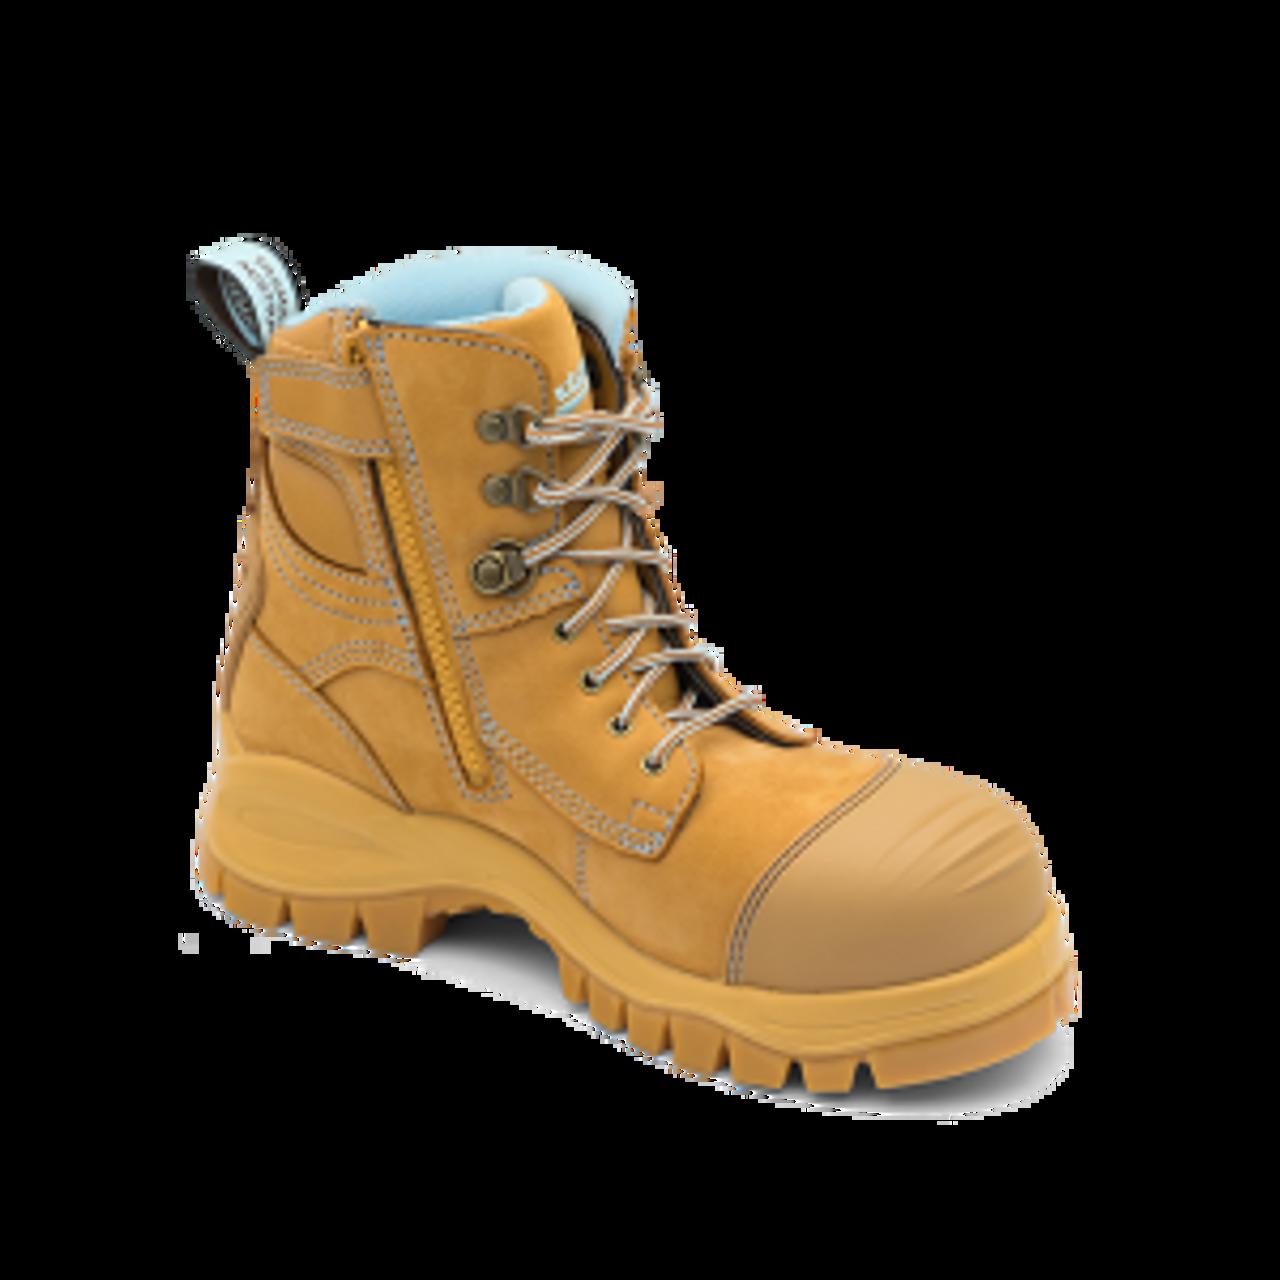 Zip Sided Steel Toe Work Boots